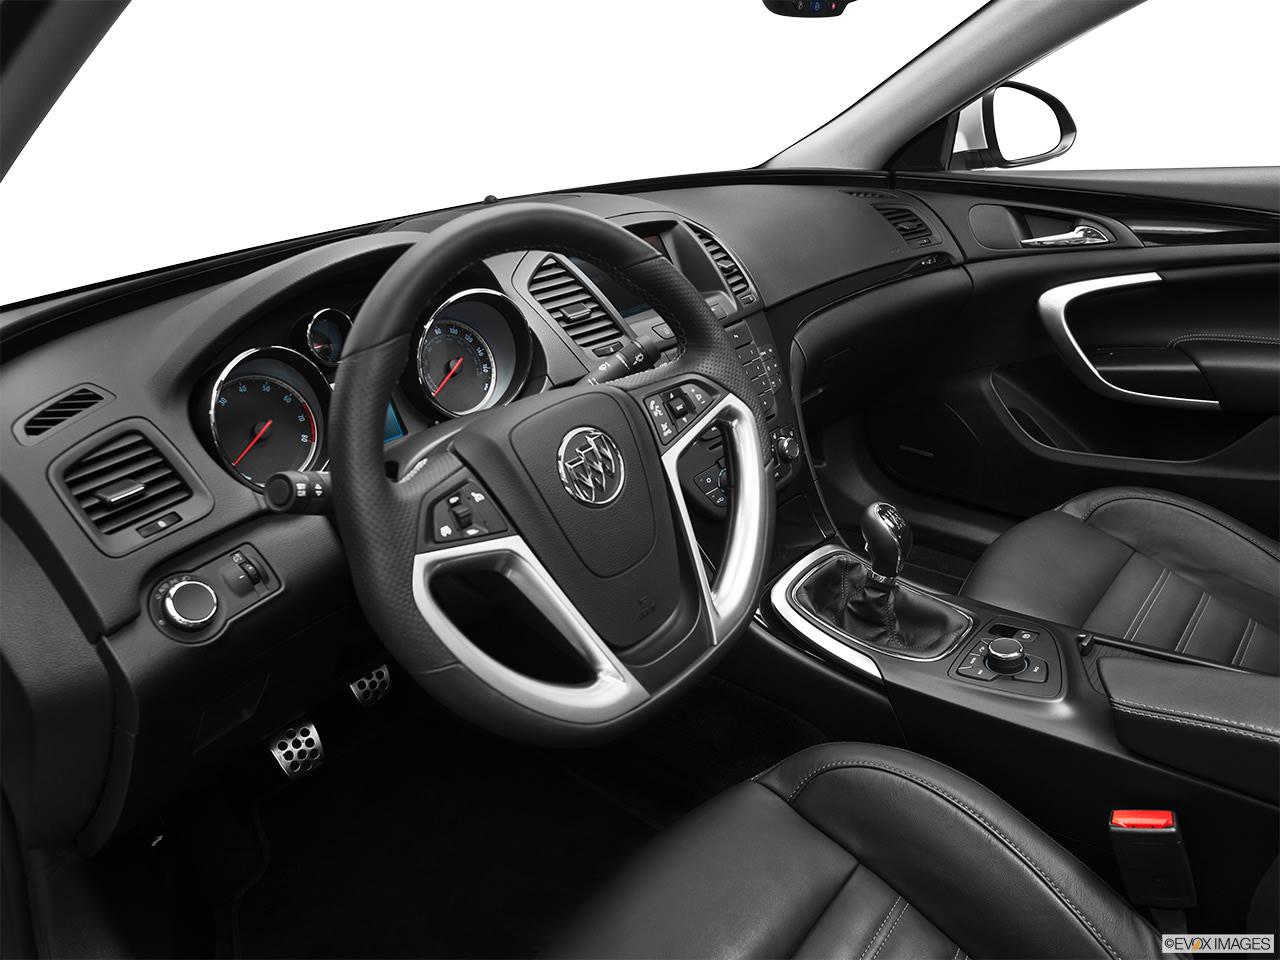 Buick Regal eAssist 2012 Interior